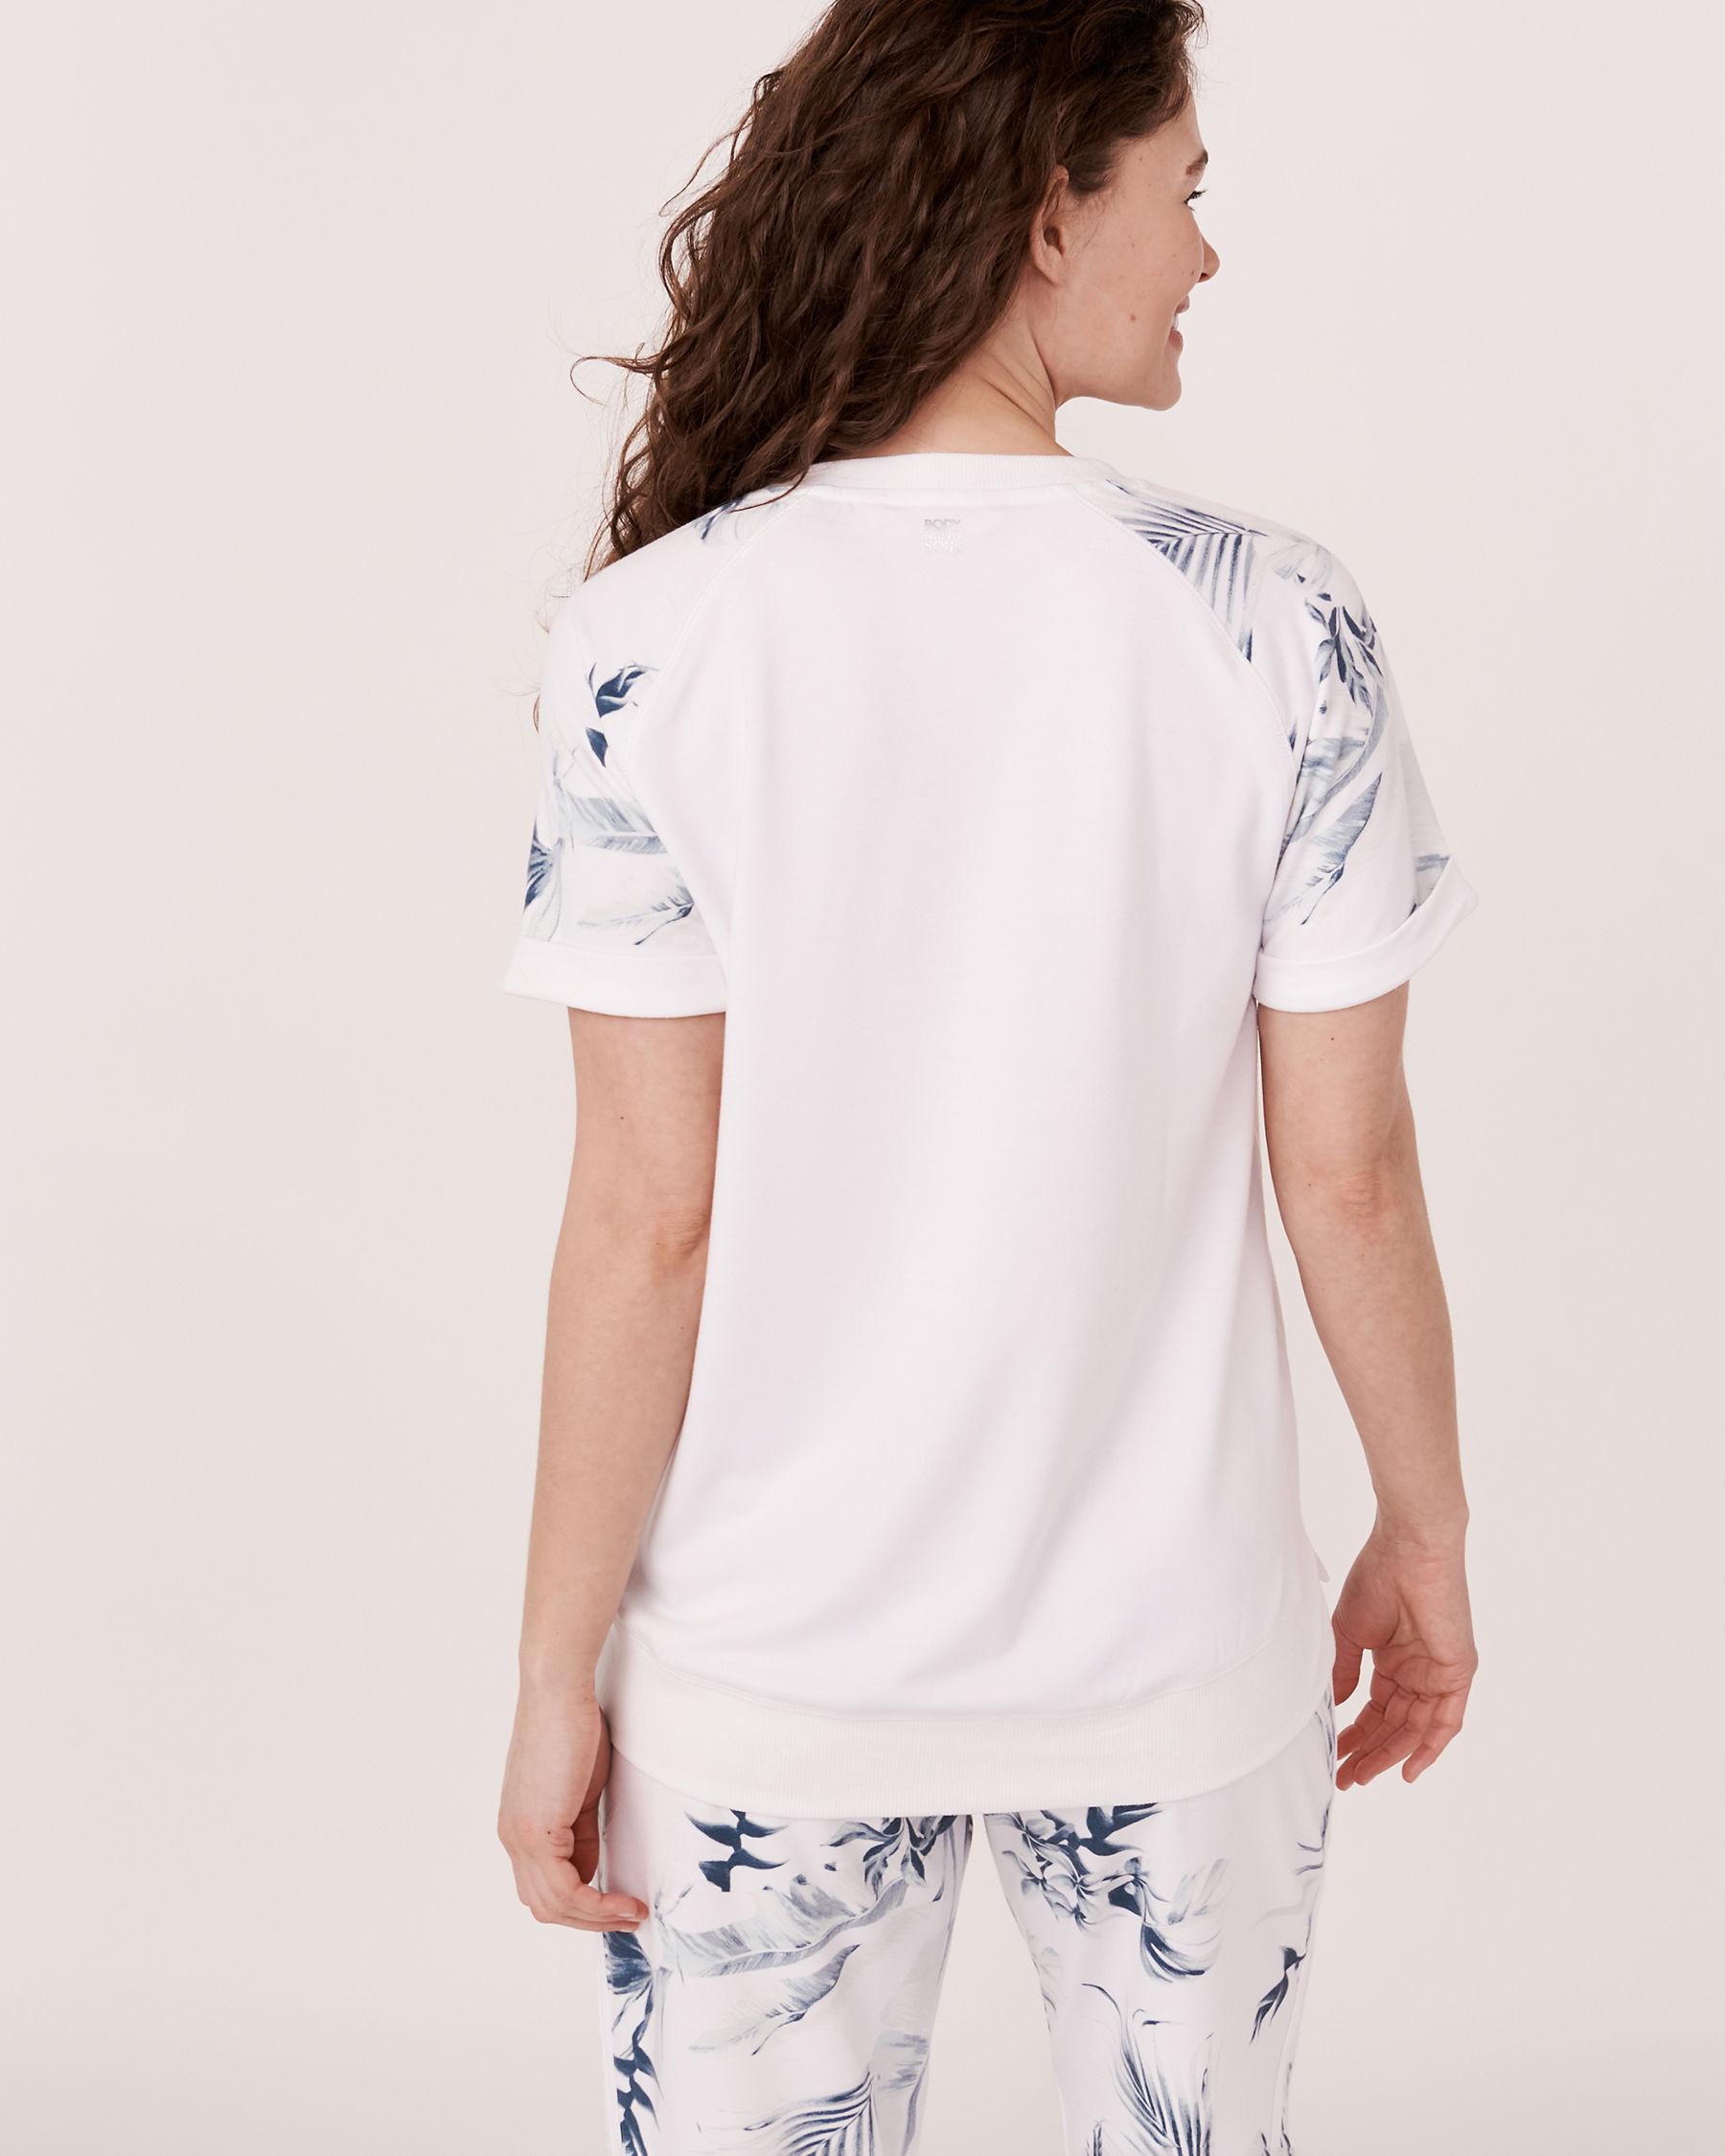 LA VIE EN ROSE Raglan Sleeve Crew Neck T-shirt Tropical print 50100005 - View2